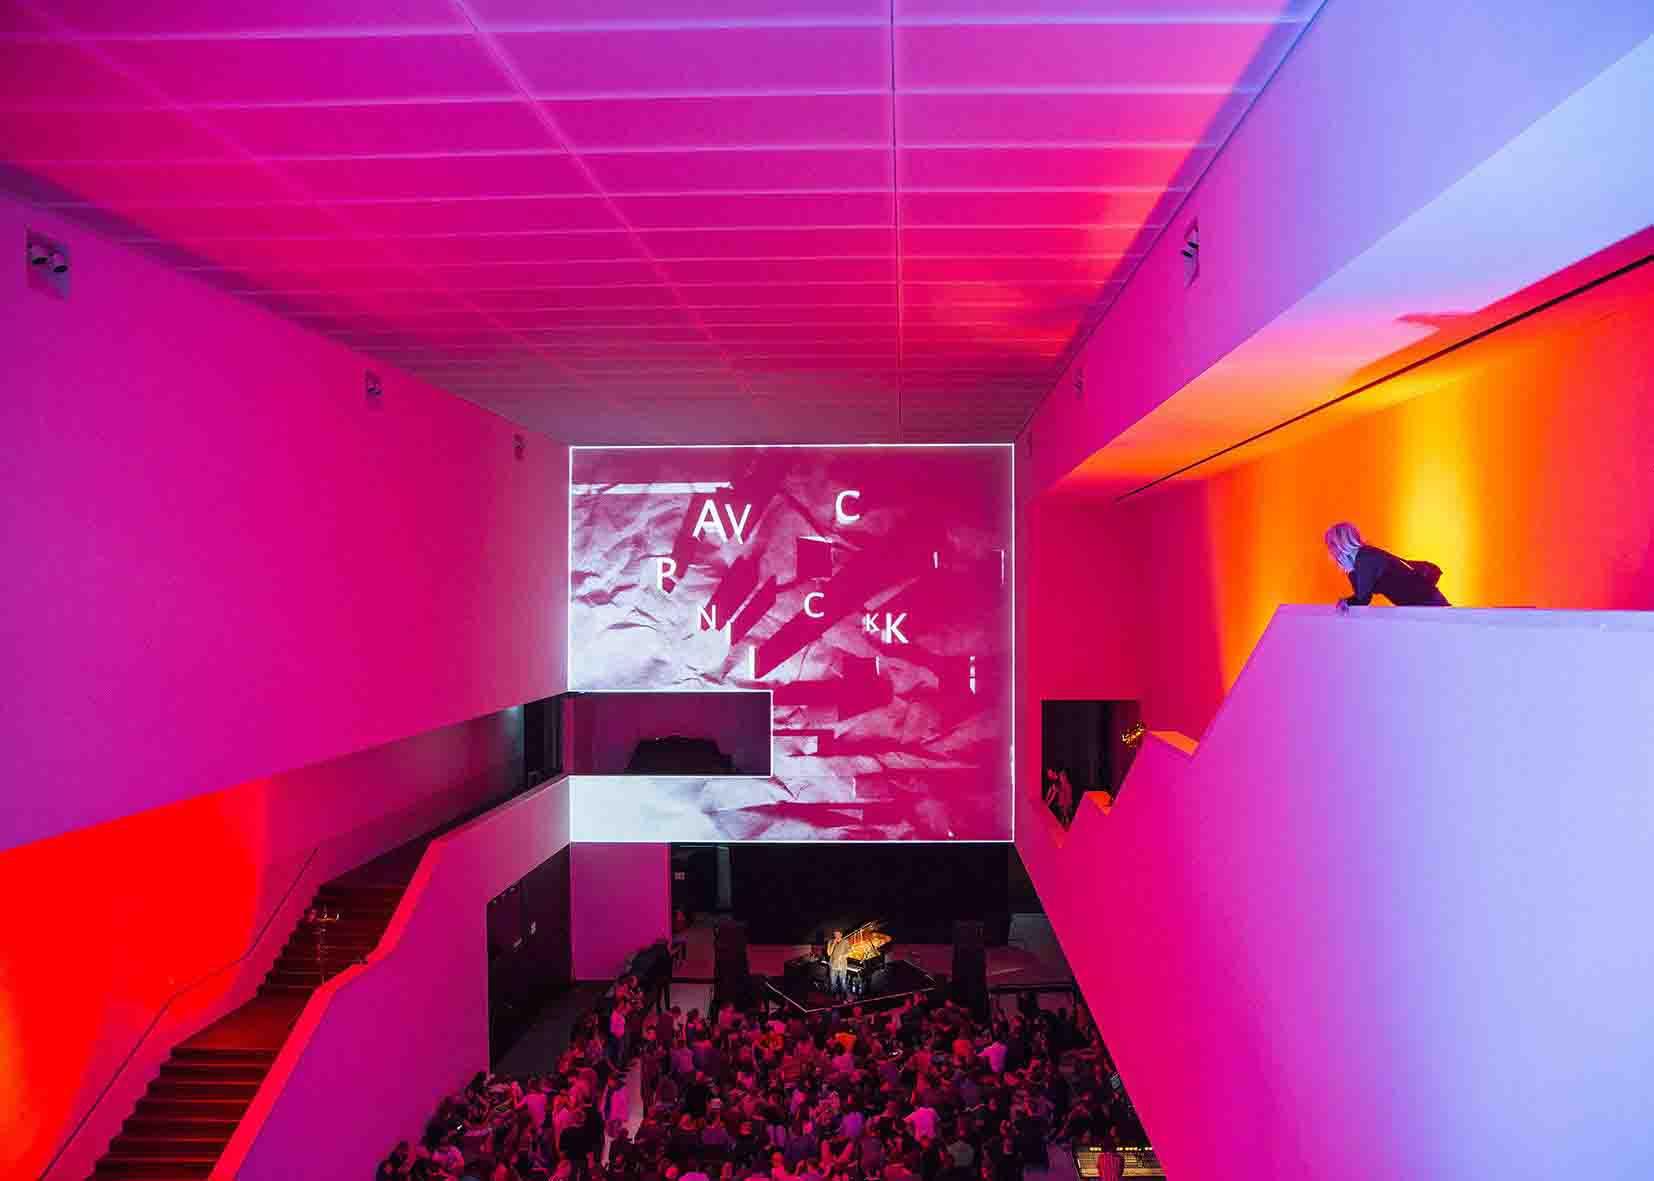 AV Picknick im Mai 2014 im Foyer des Museums. Foto: LWL/Neander